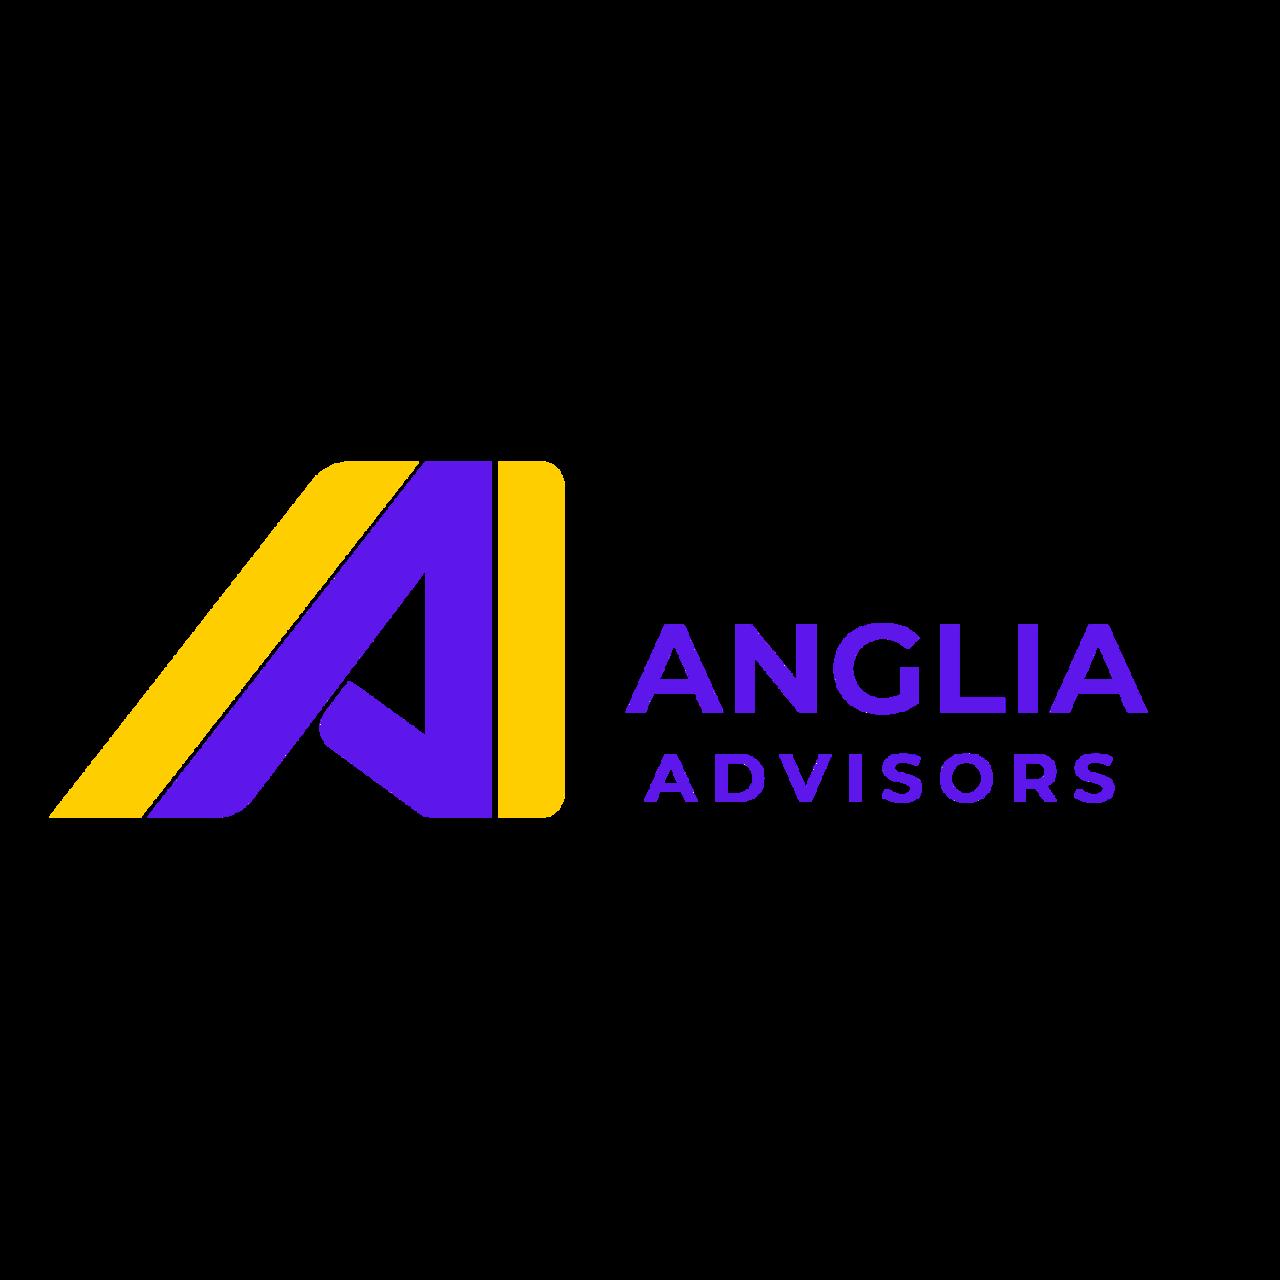 ANGLES, from Anglia Advisors